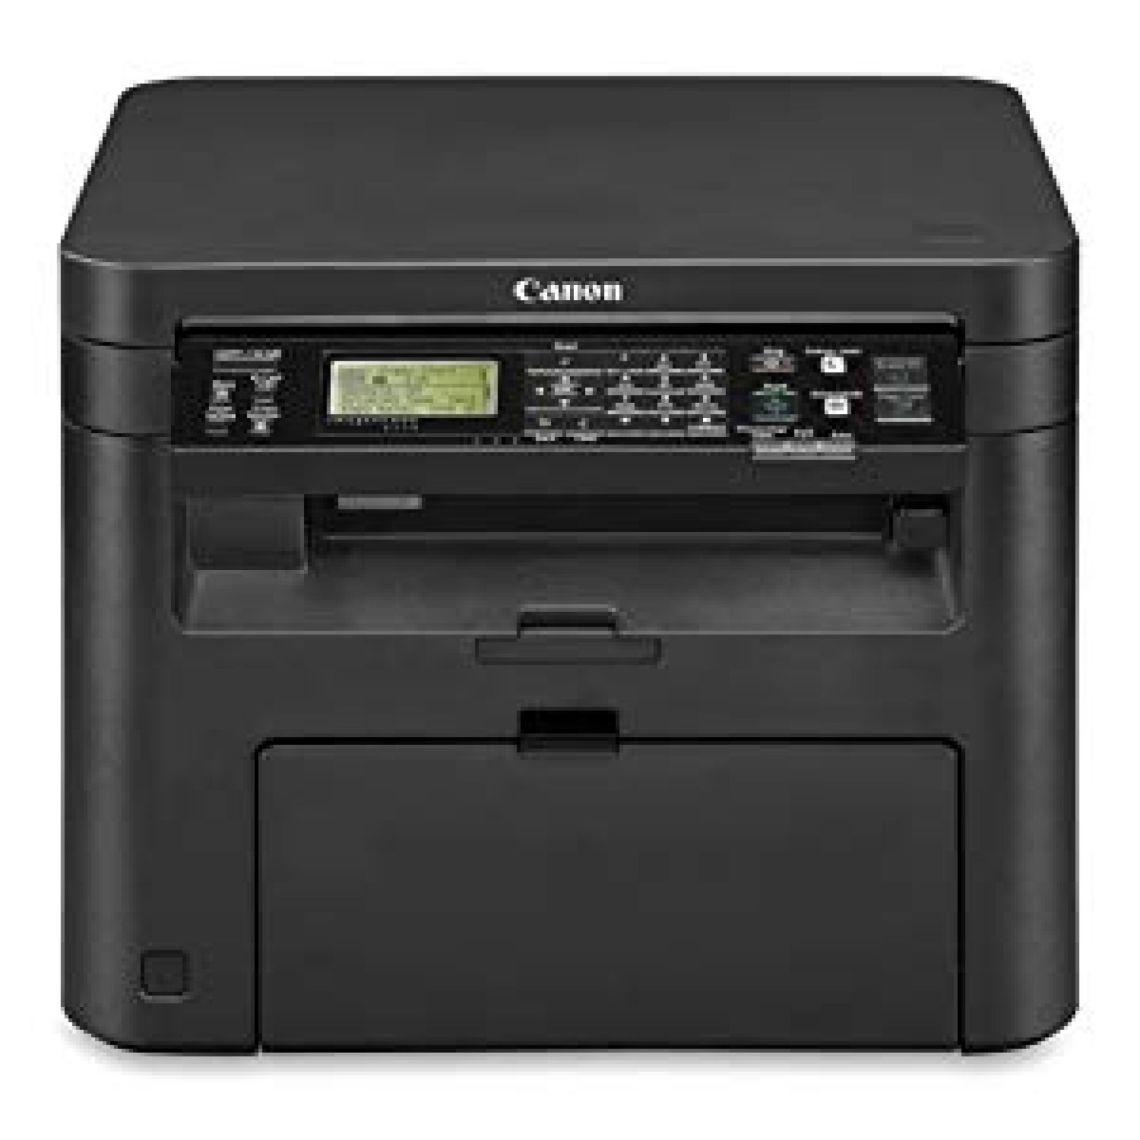 Amazon.com: Canon imageCLASS D570 Monochrome Laser Printer with Scanner and Copier: Electronics